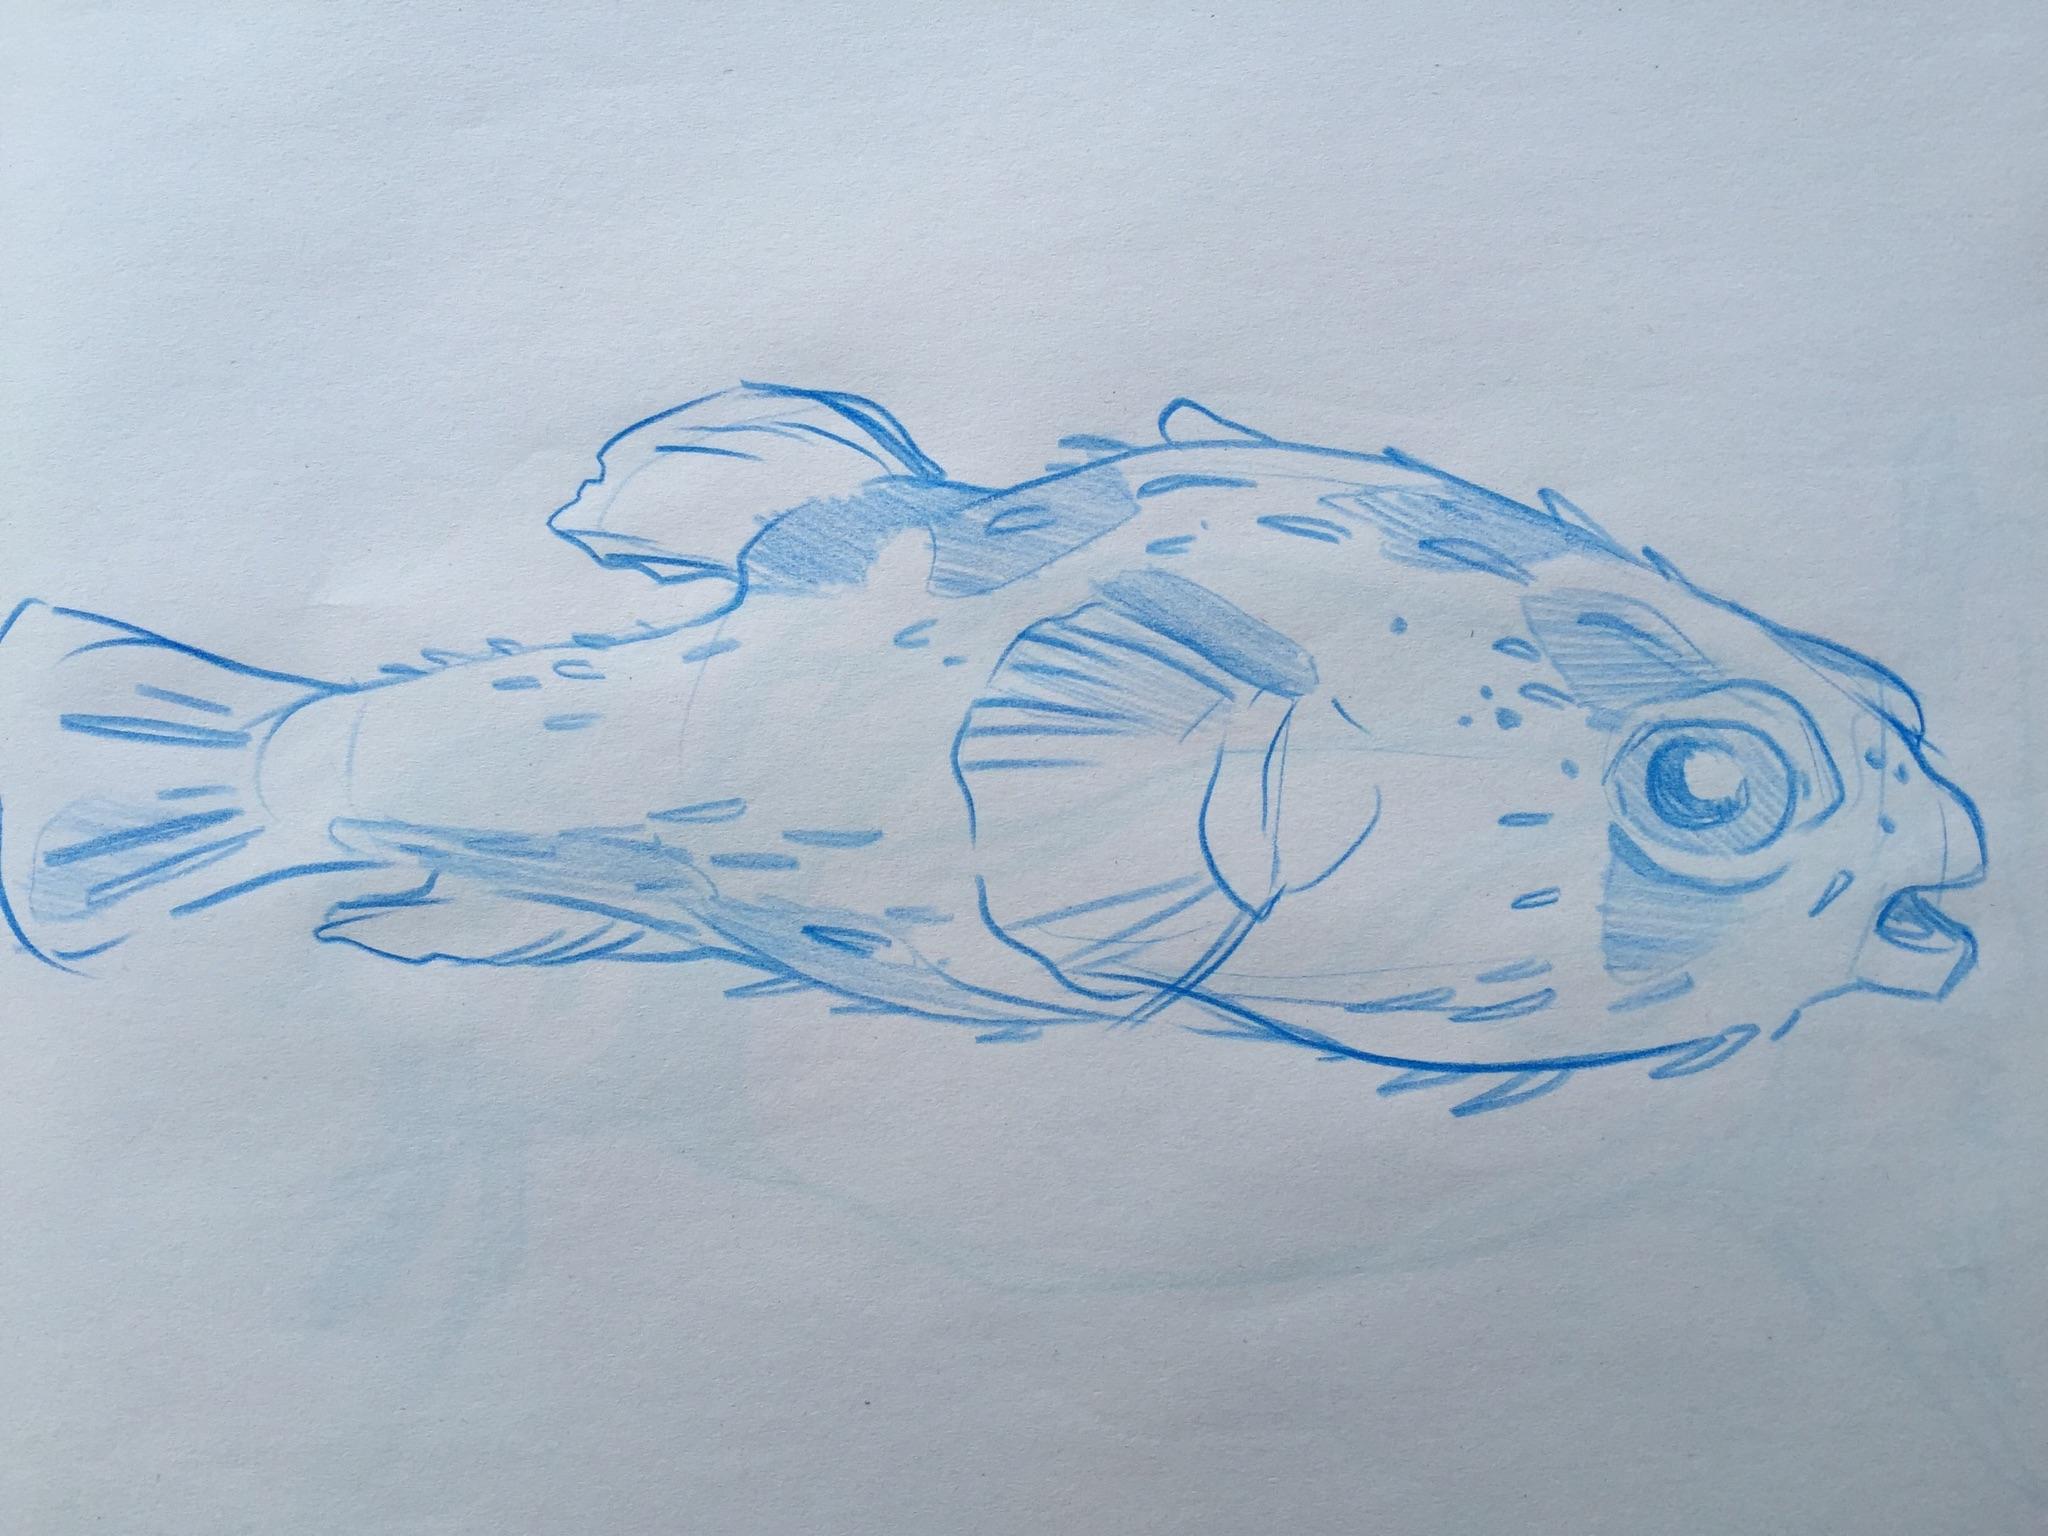 pufferfish sketch.jpg